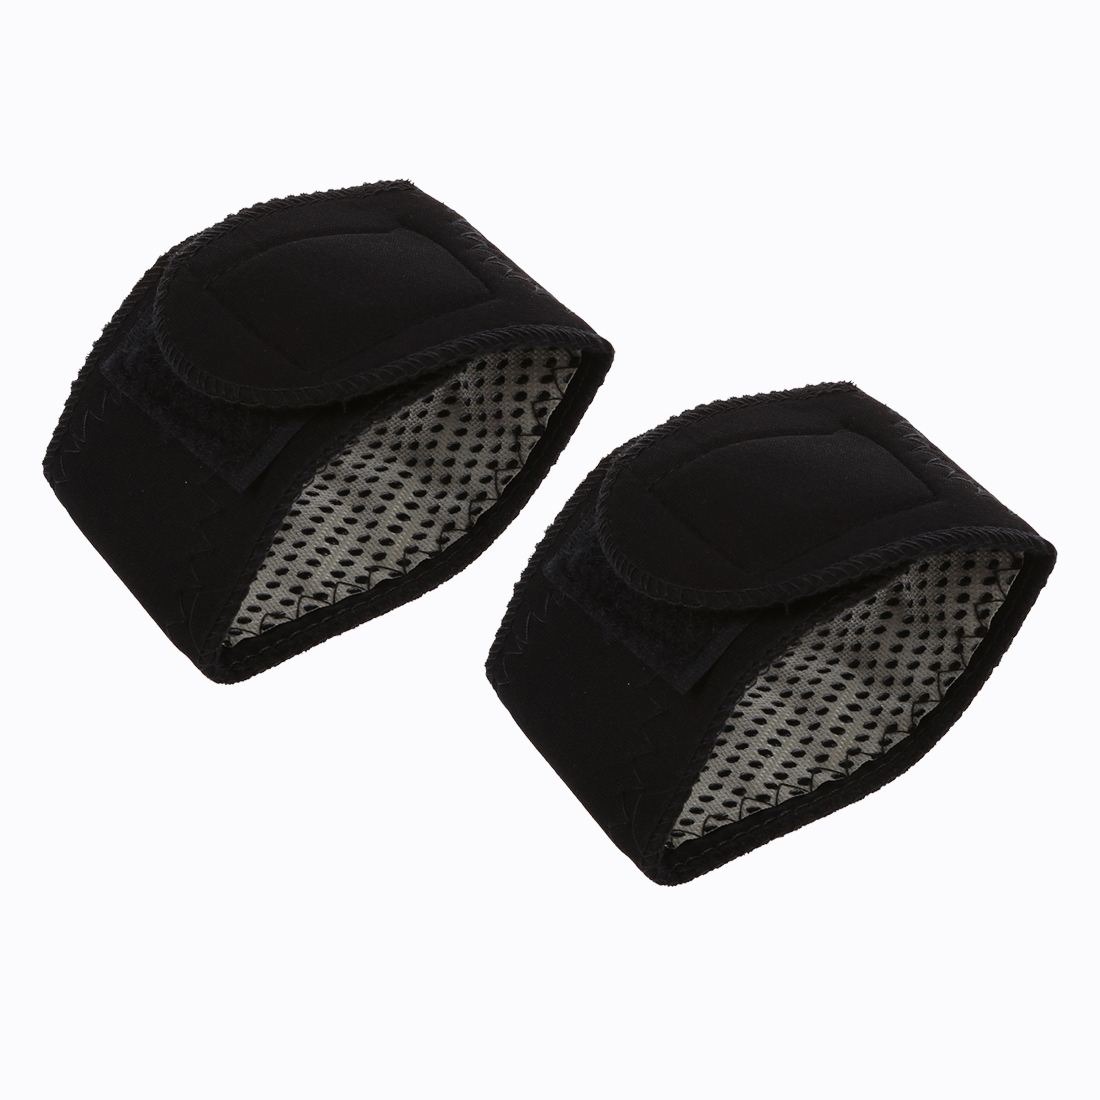 2x Tourmaline Self Heating Wrist Brace Support Strap Mangnetic Far Infrared Ray